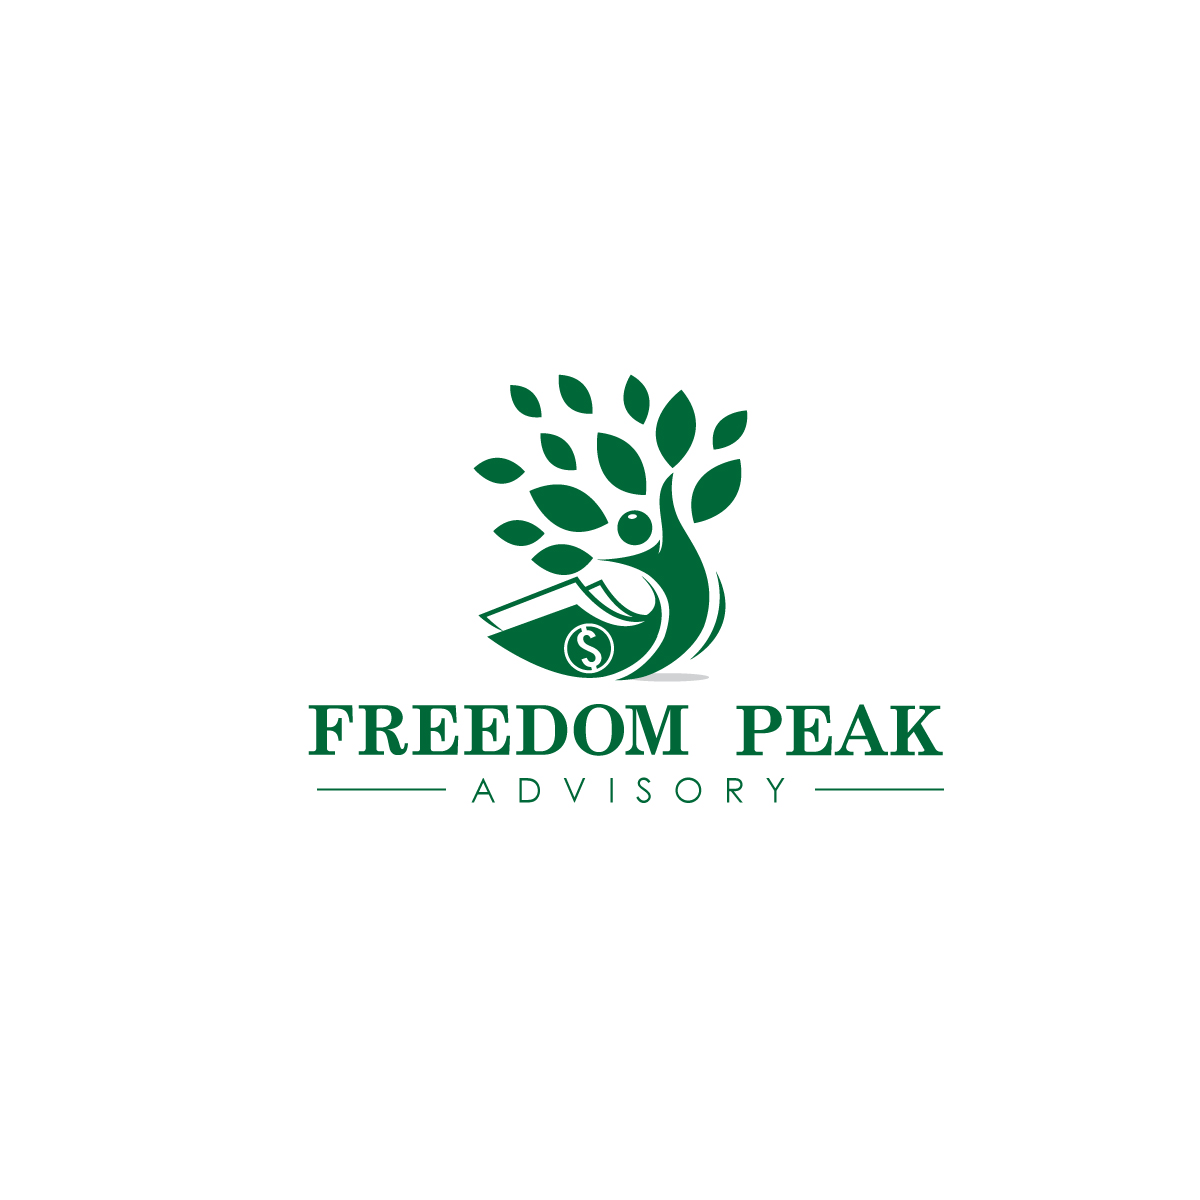 Logo Design For Freedom Peak Advisory By Creative Bugs